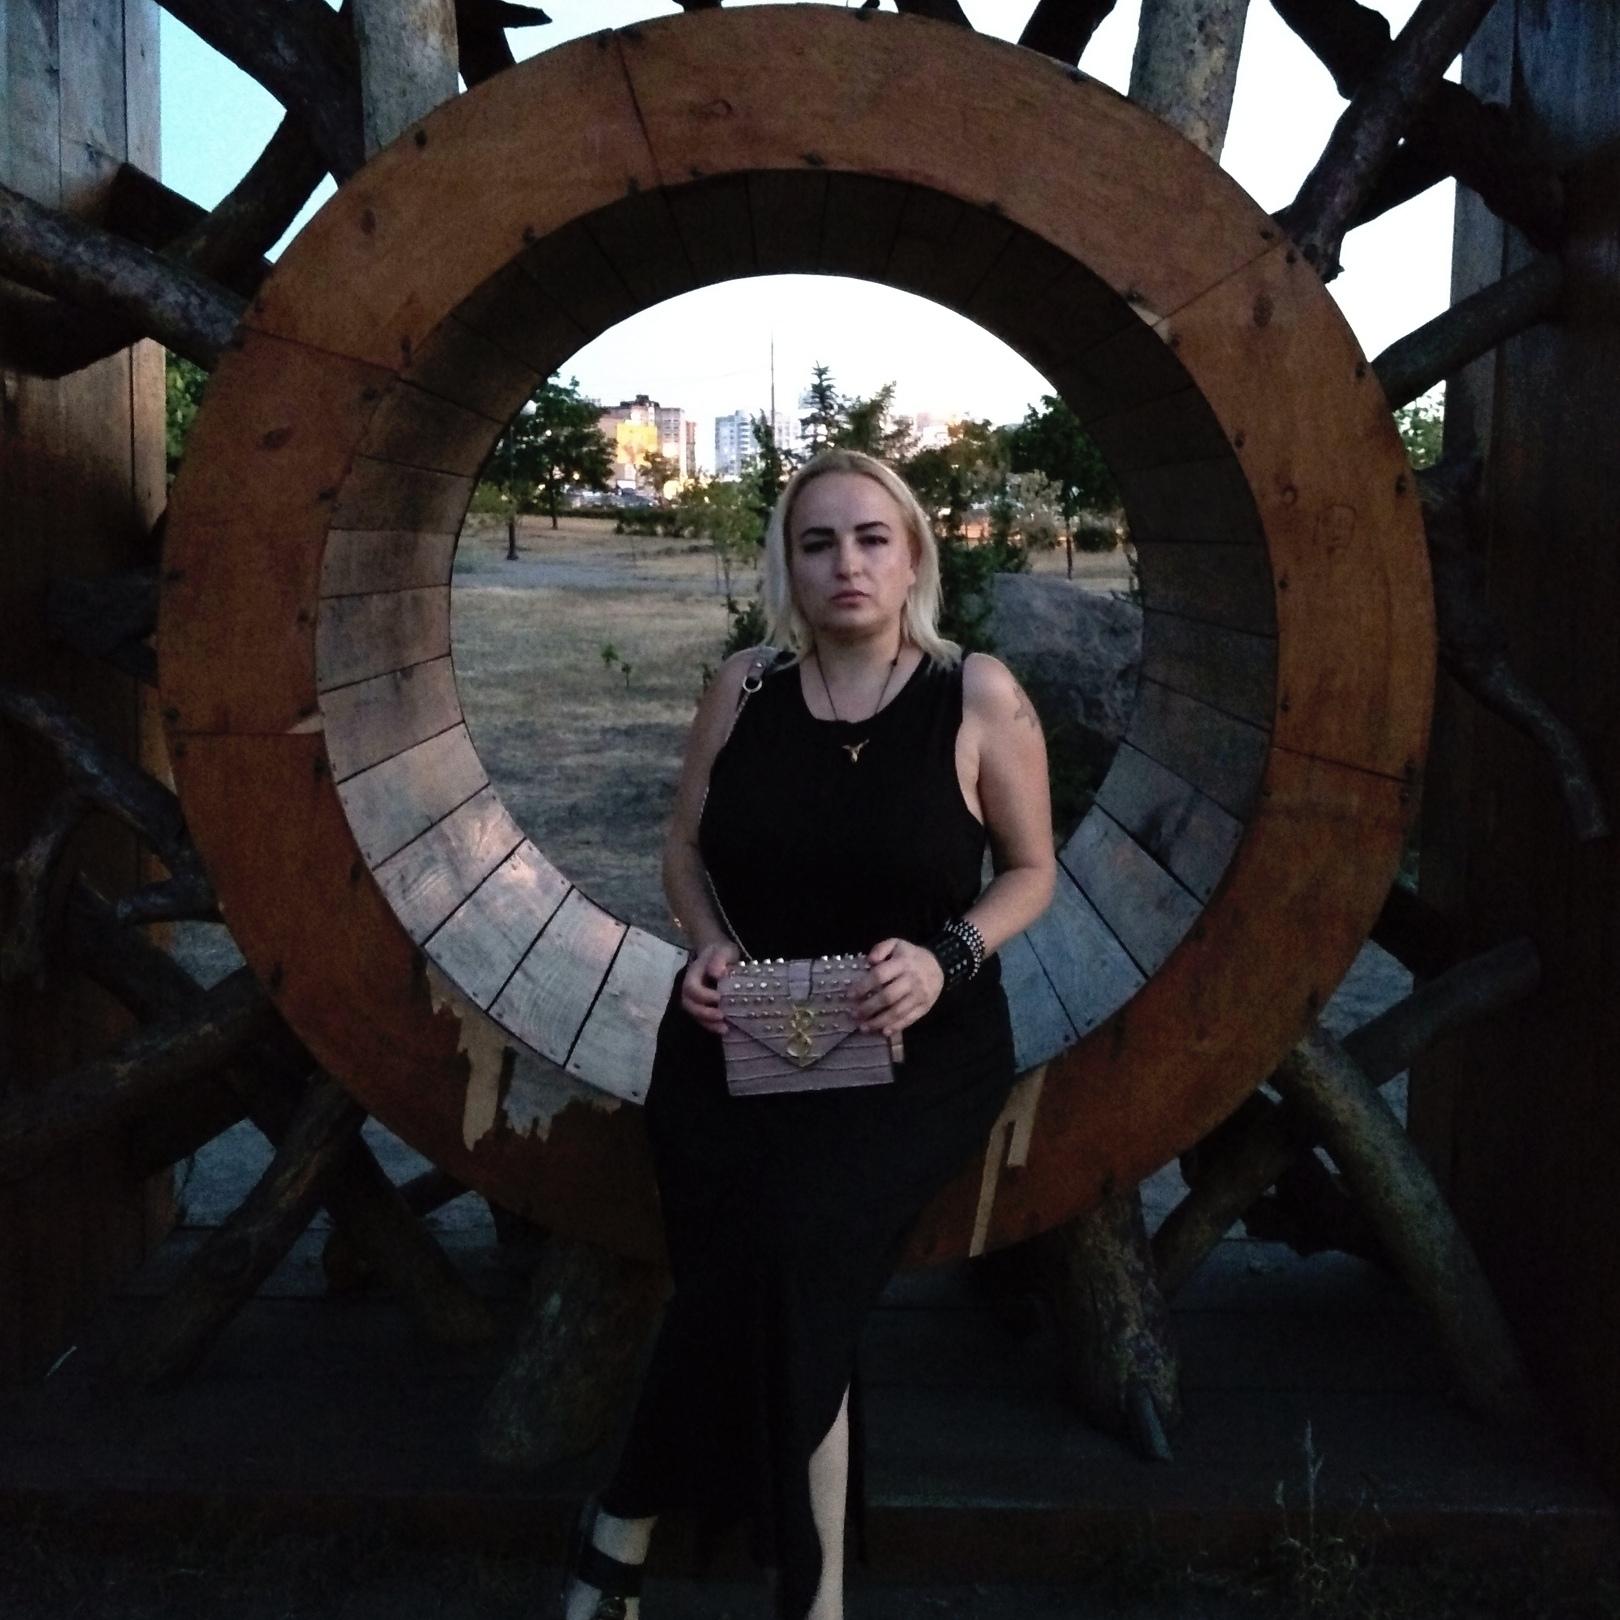 Елена Руденко (Валтея). Украина. Киев. Фото и описание.  UcMvqLcFLaU